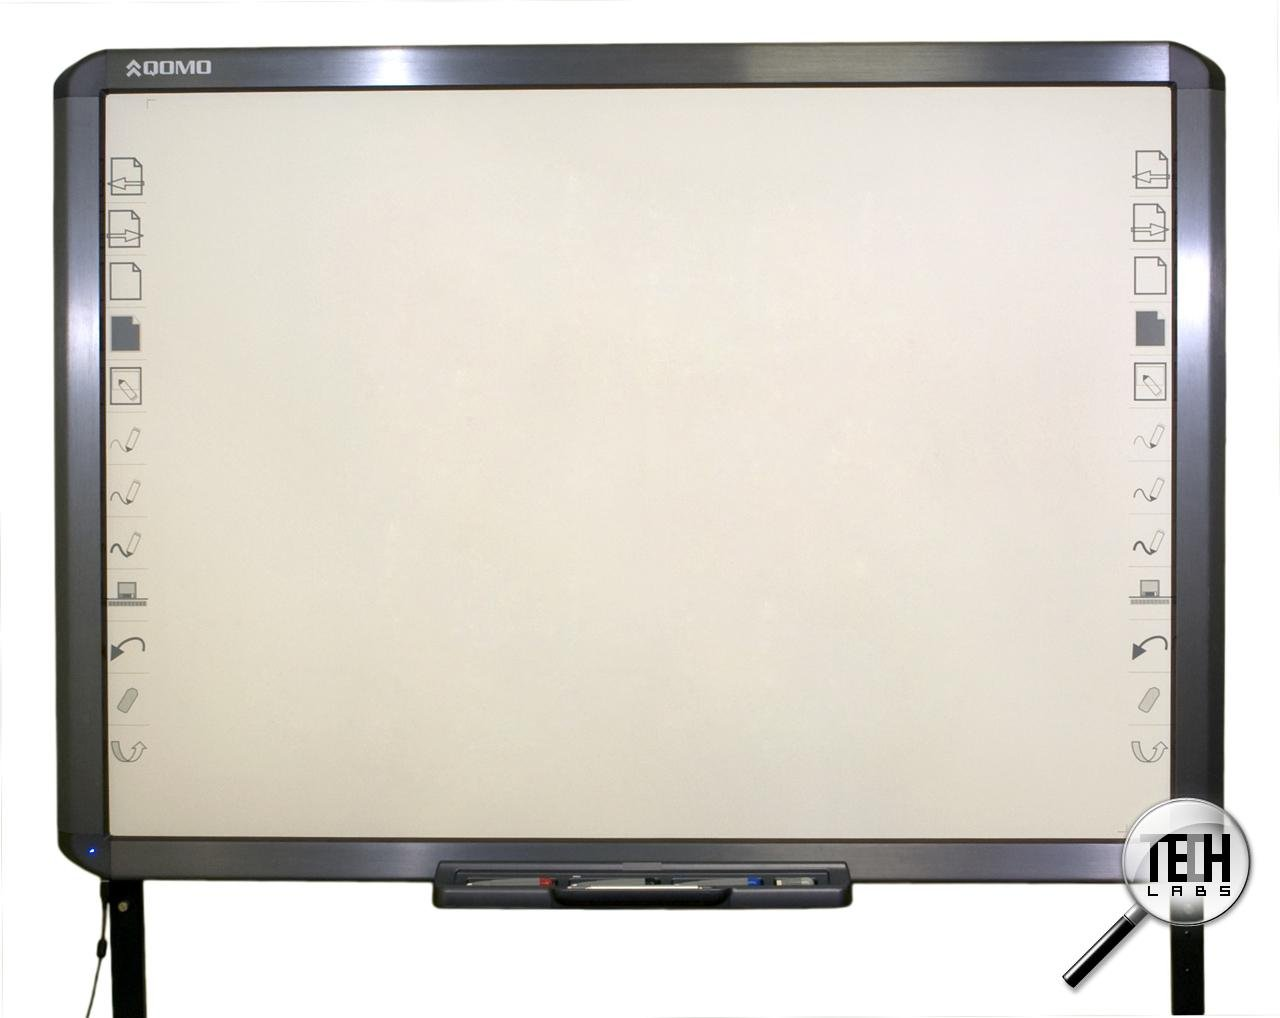 smartboard clipart transparent - HD1280×1018